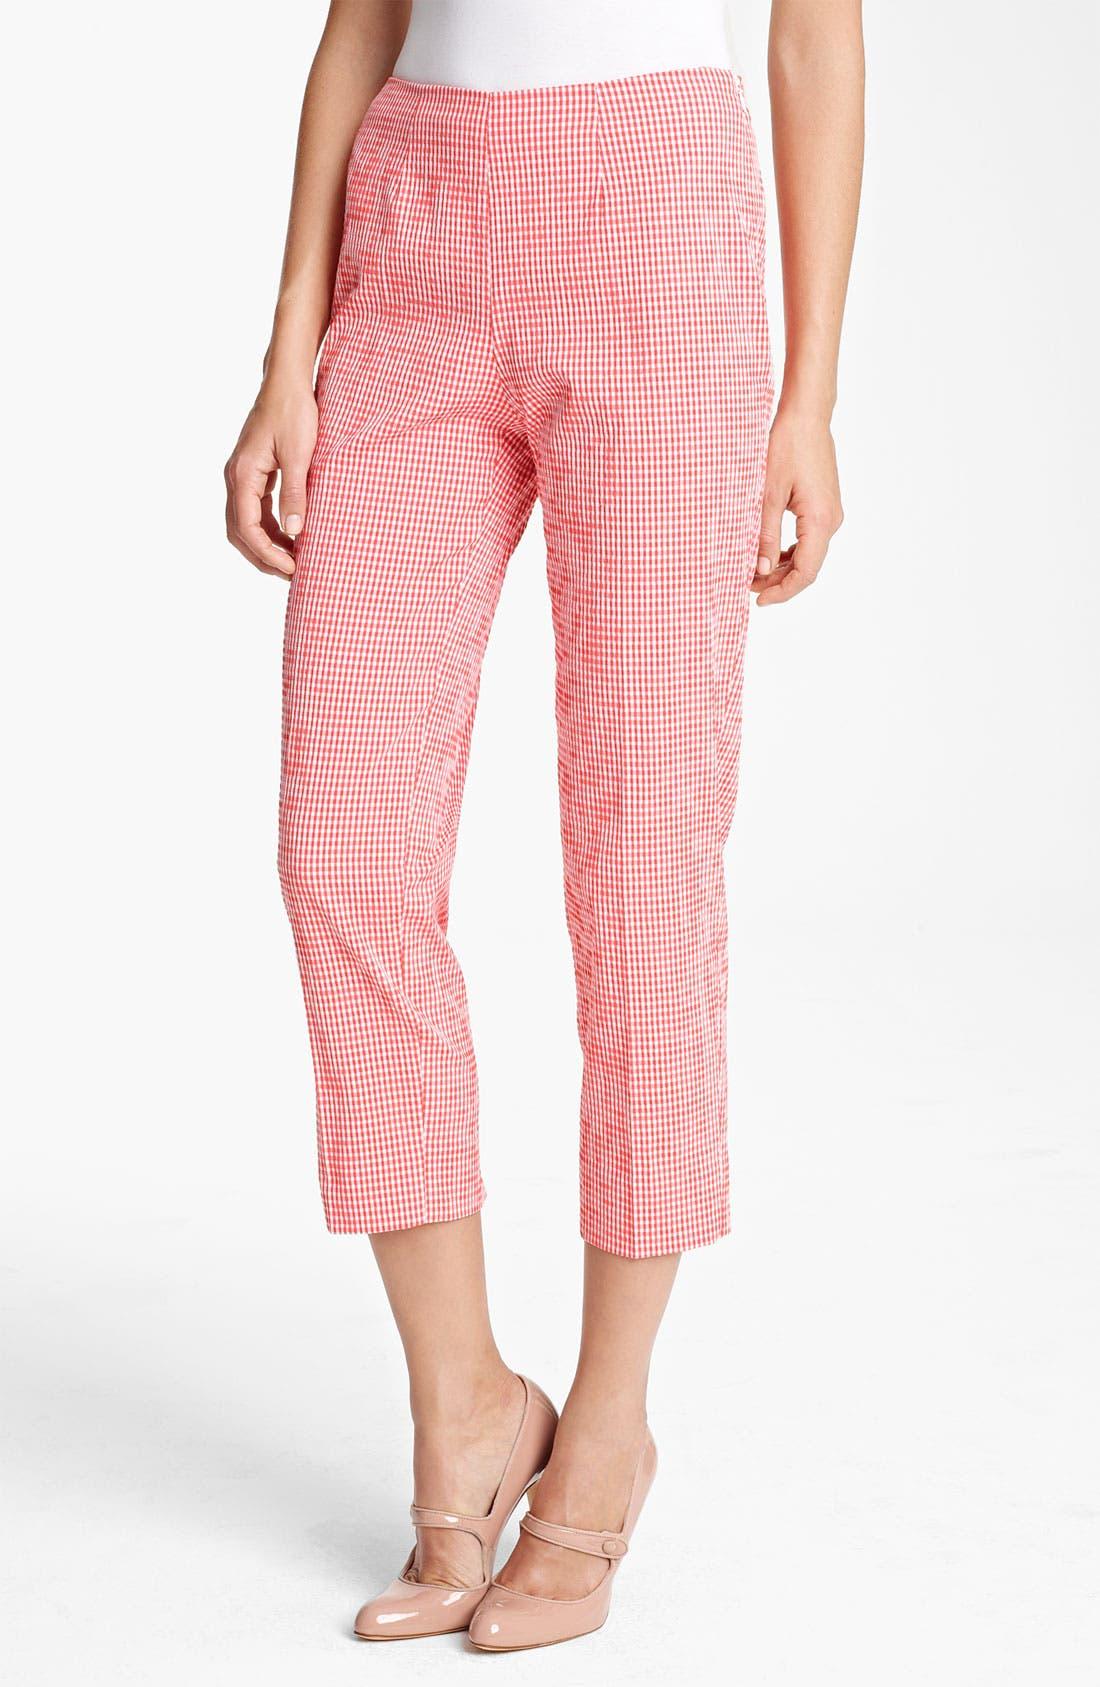 Main Image - Piazza Sempione 'Audrey' Gingham Stretch Cotton Pants